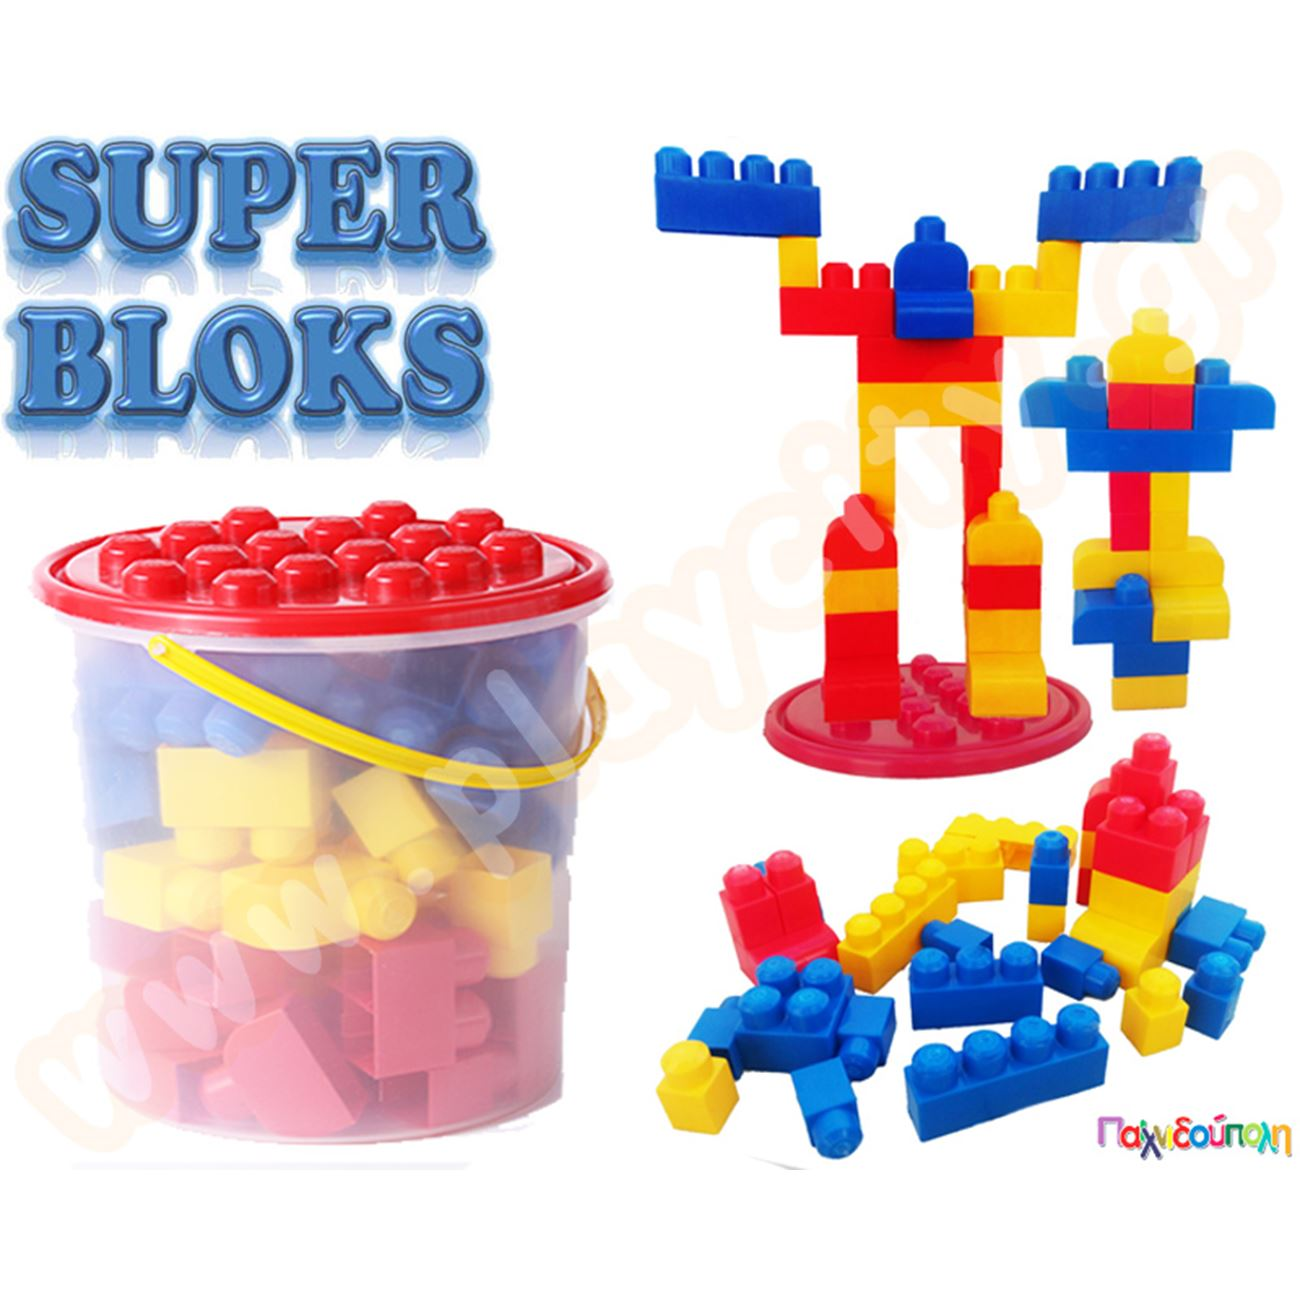 492ddcb02d2 Κούνιες για μωρά και παιδιά Super κουβάς με 48 τουβλάκια (κόκκινο ...